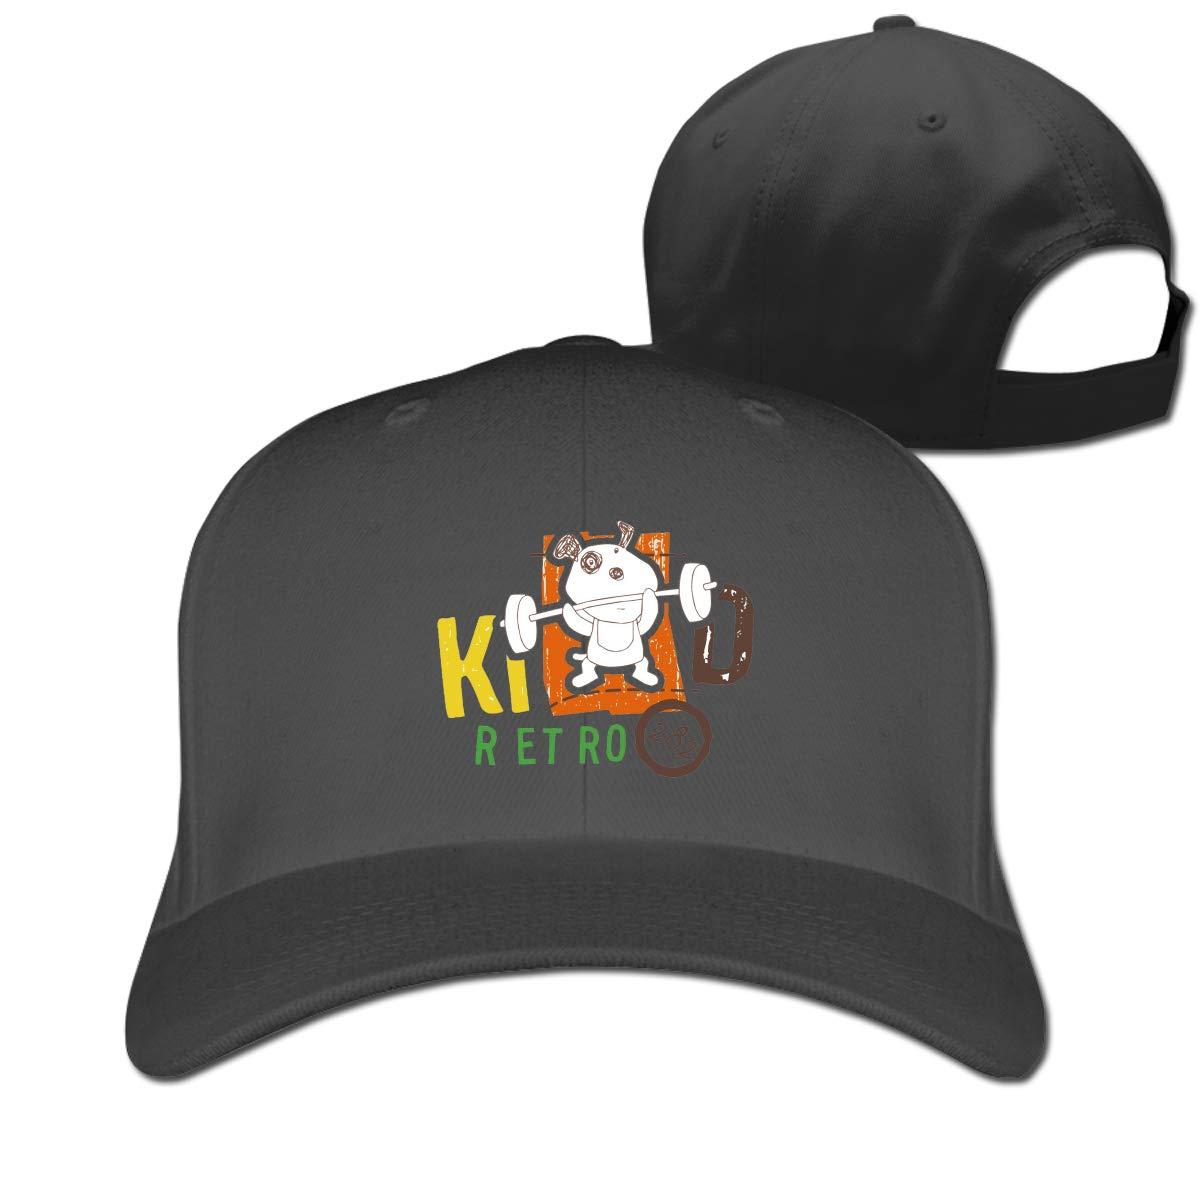 R ET RO Fashion Adjustable Cotton Baseball Caps Trucker Driver Hat Outdoor Cap Black